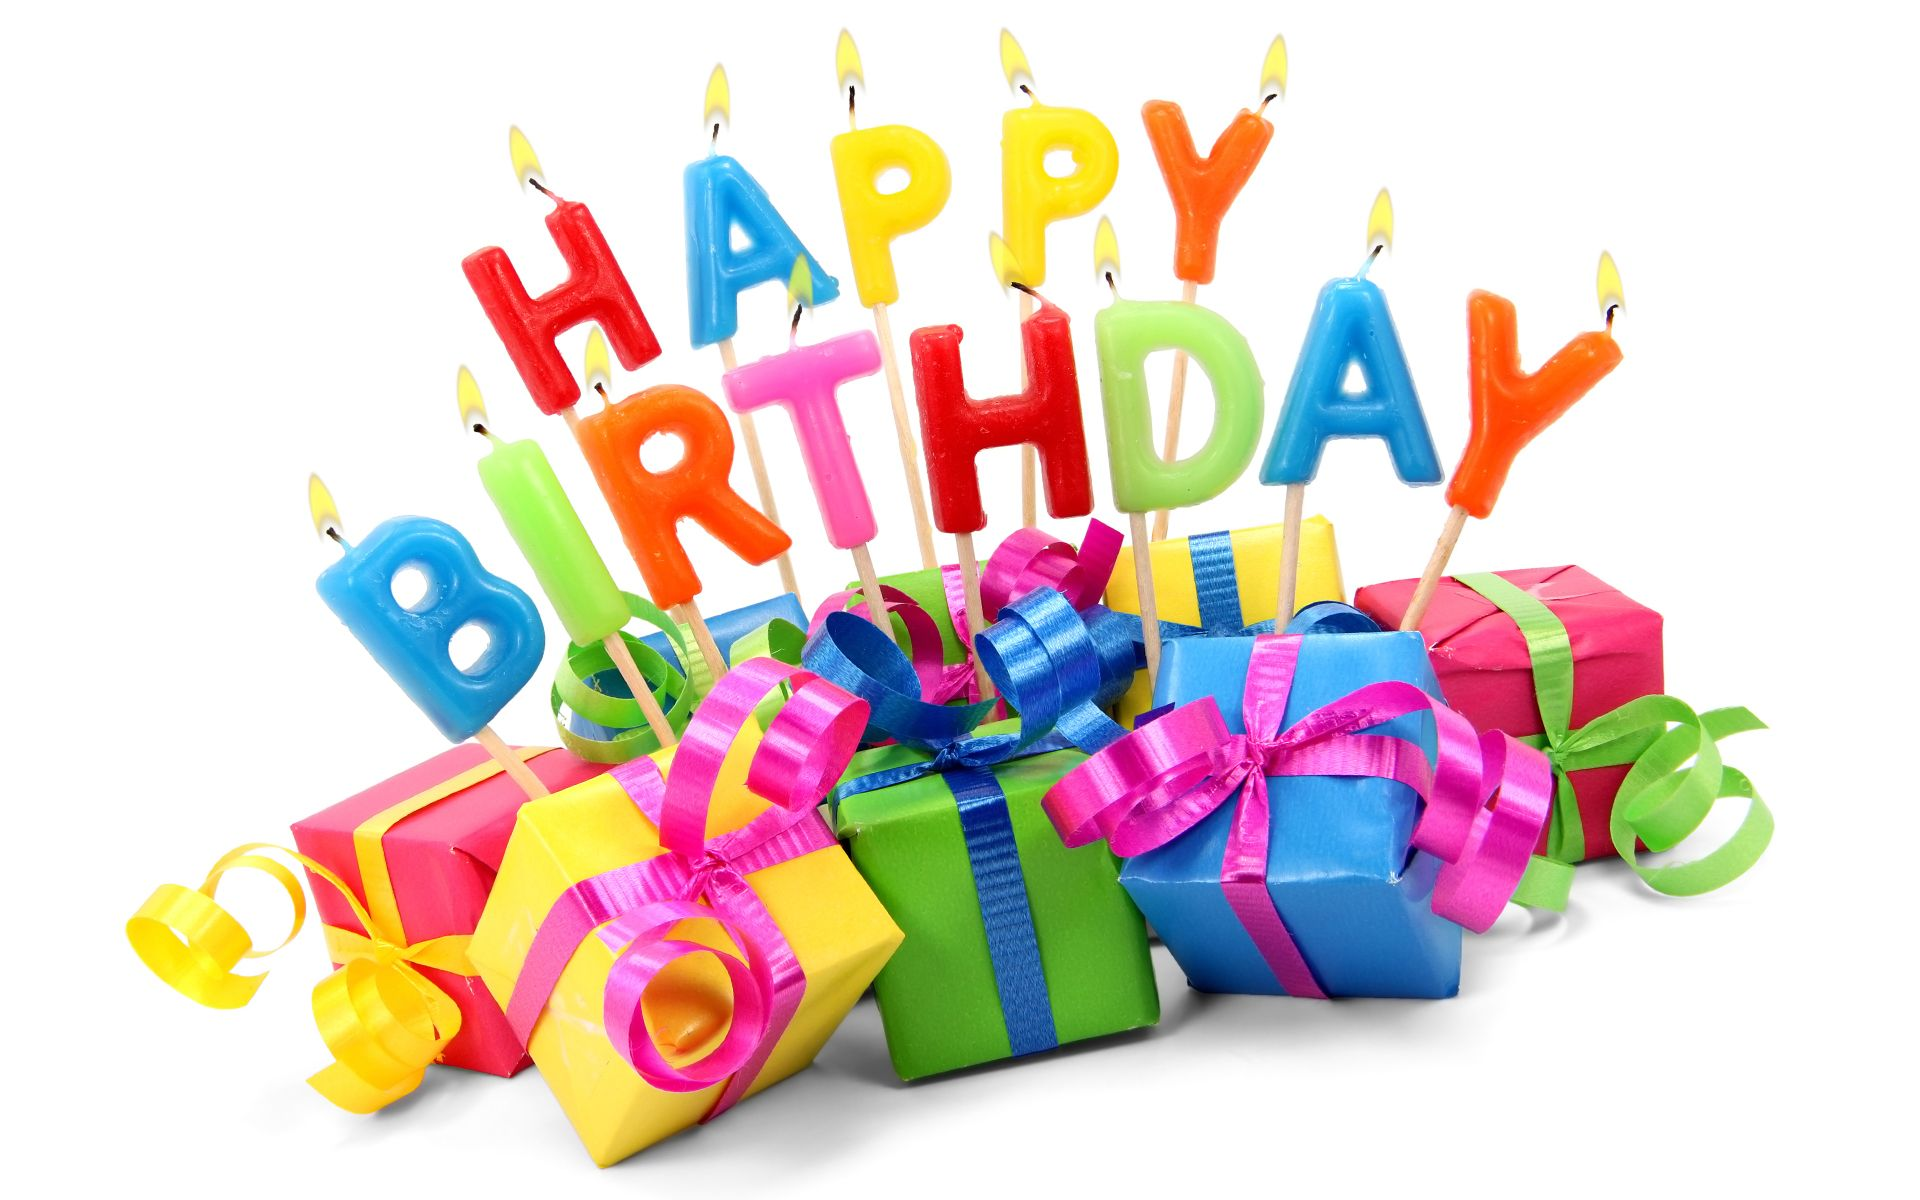 Pin By Jeanie Torgerson On Birthday Pinterest Happy Birthday